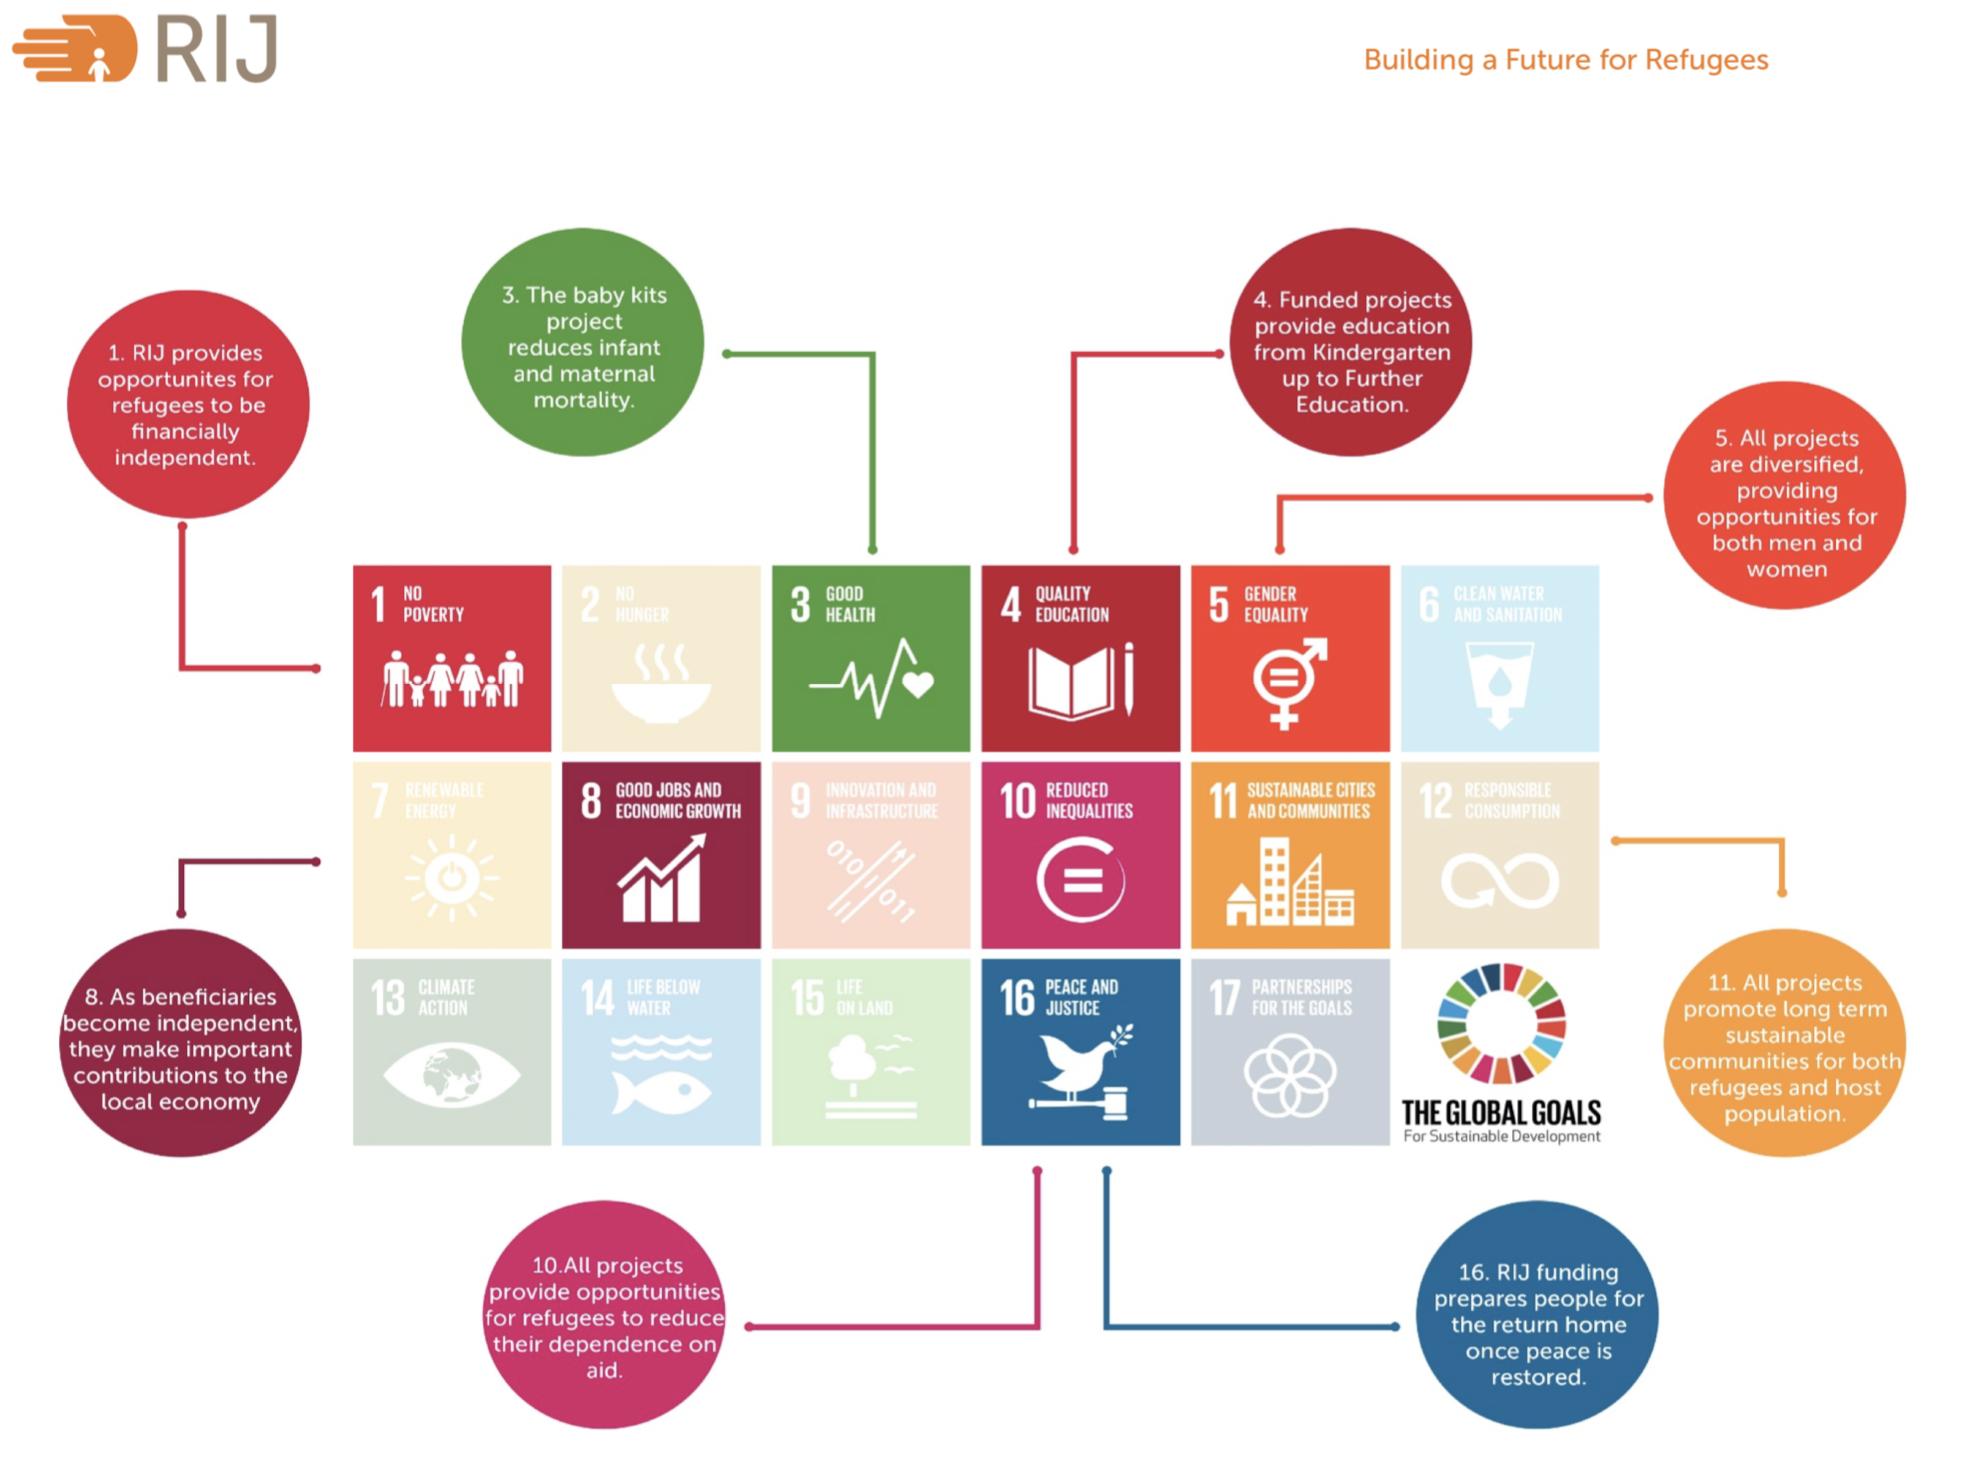 RIJ SDGs Alignment